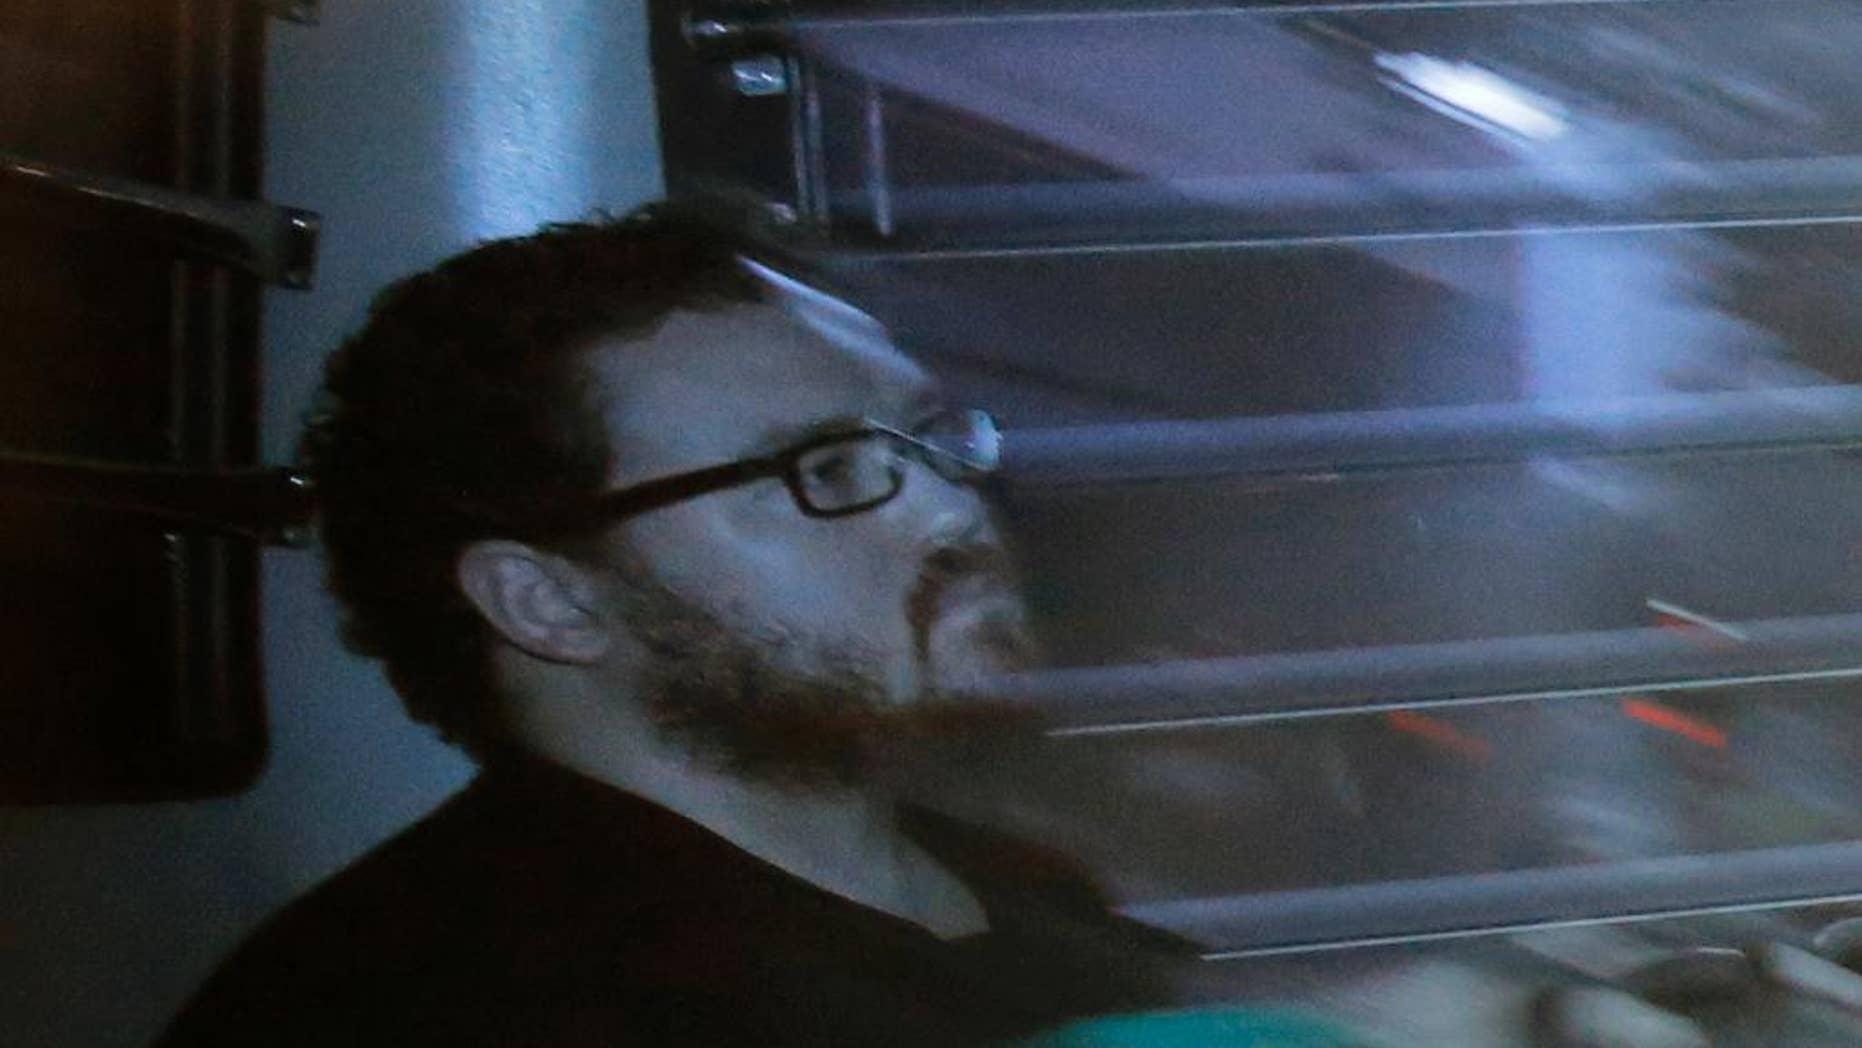 Rurik Jutting sitting in a prison bus in 2014.